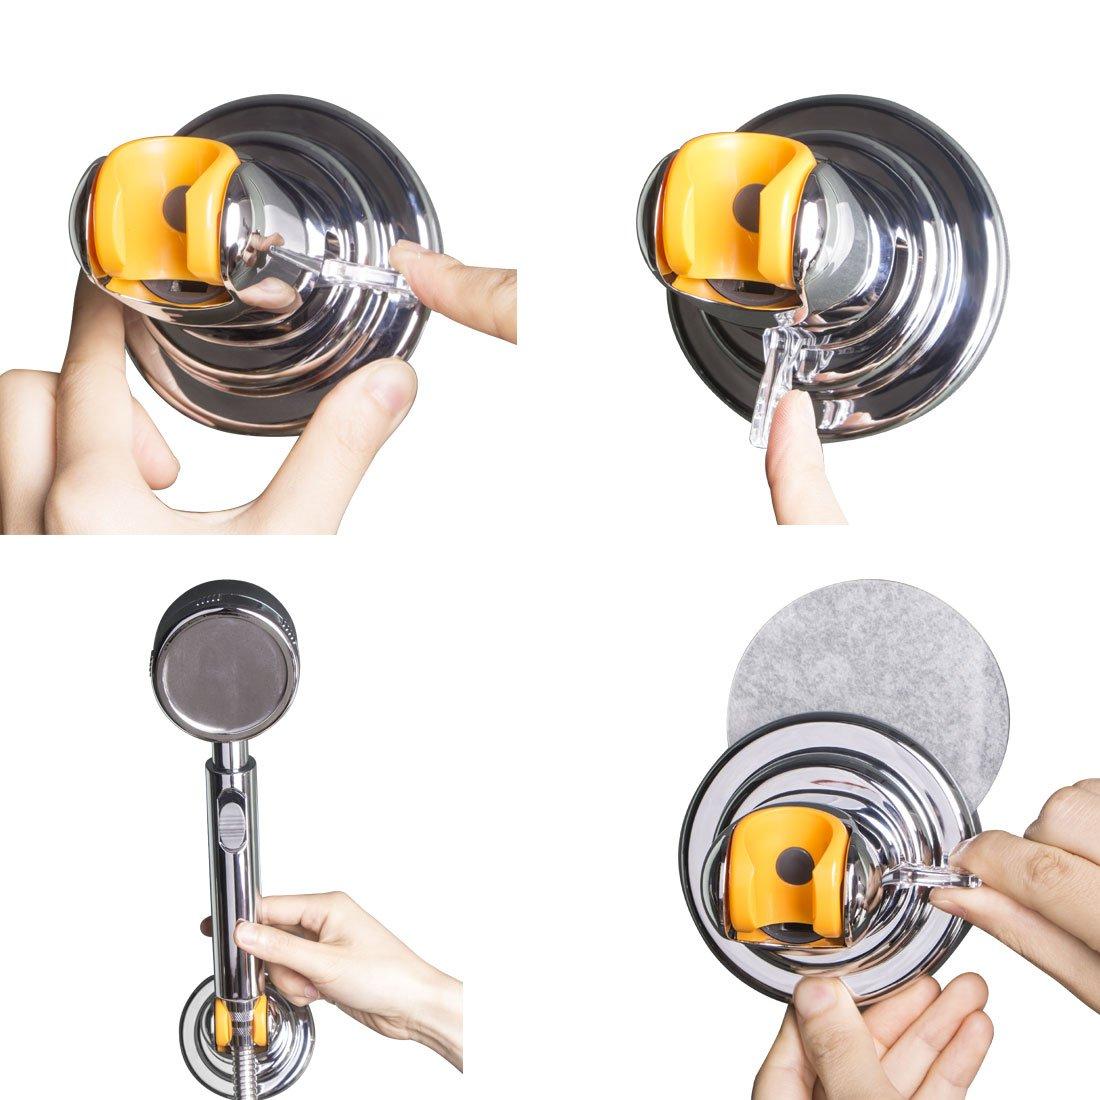 4FQ Angle Adjustable Shower Head Holder Vacuum Suction Cup Shower Holder Bracket Removable Wall Mount Bracket Moistureproof Waterproof Heavy Duty Reusable Holder Bracket For Bathroom Hotel,Chrome Finish